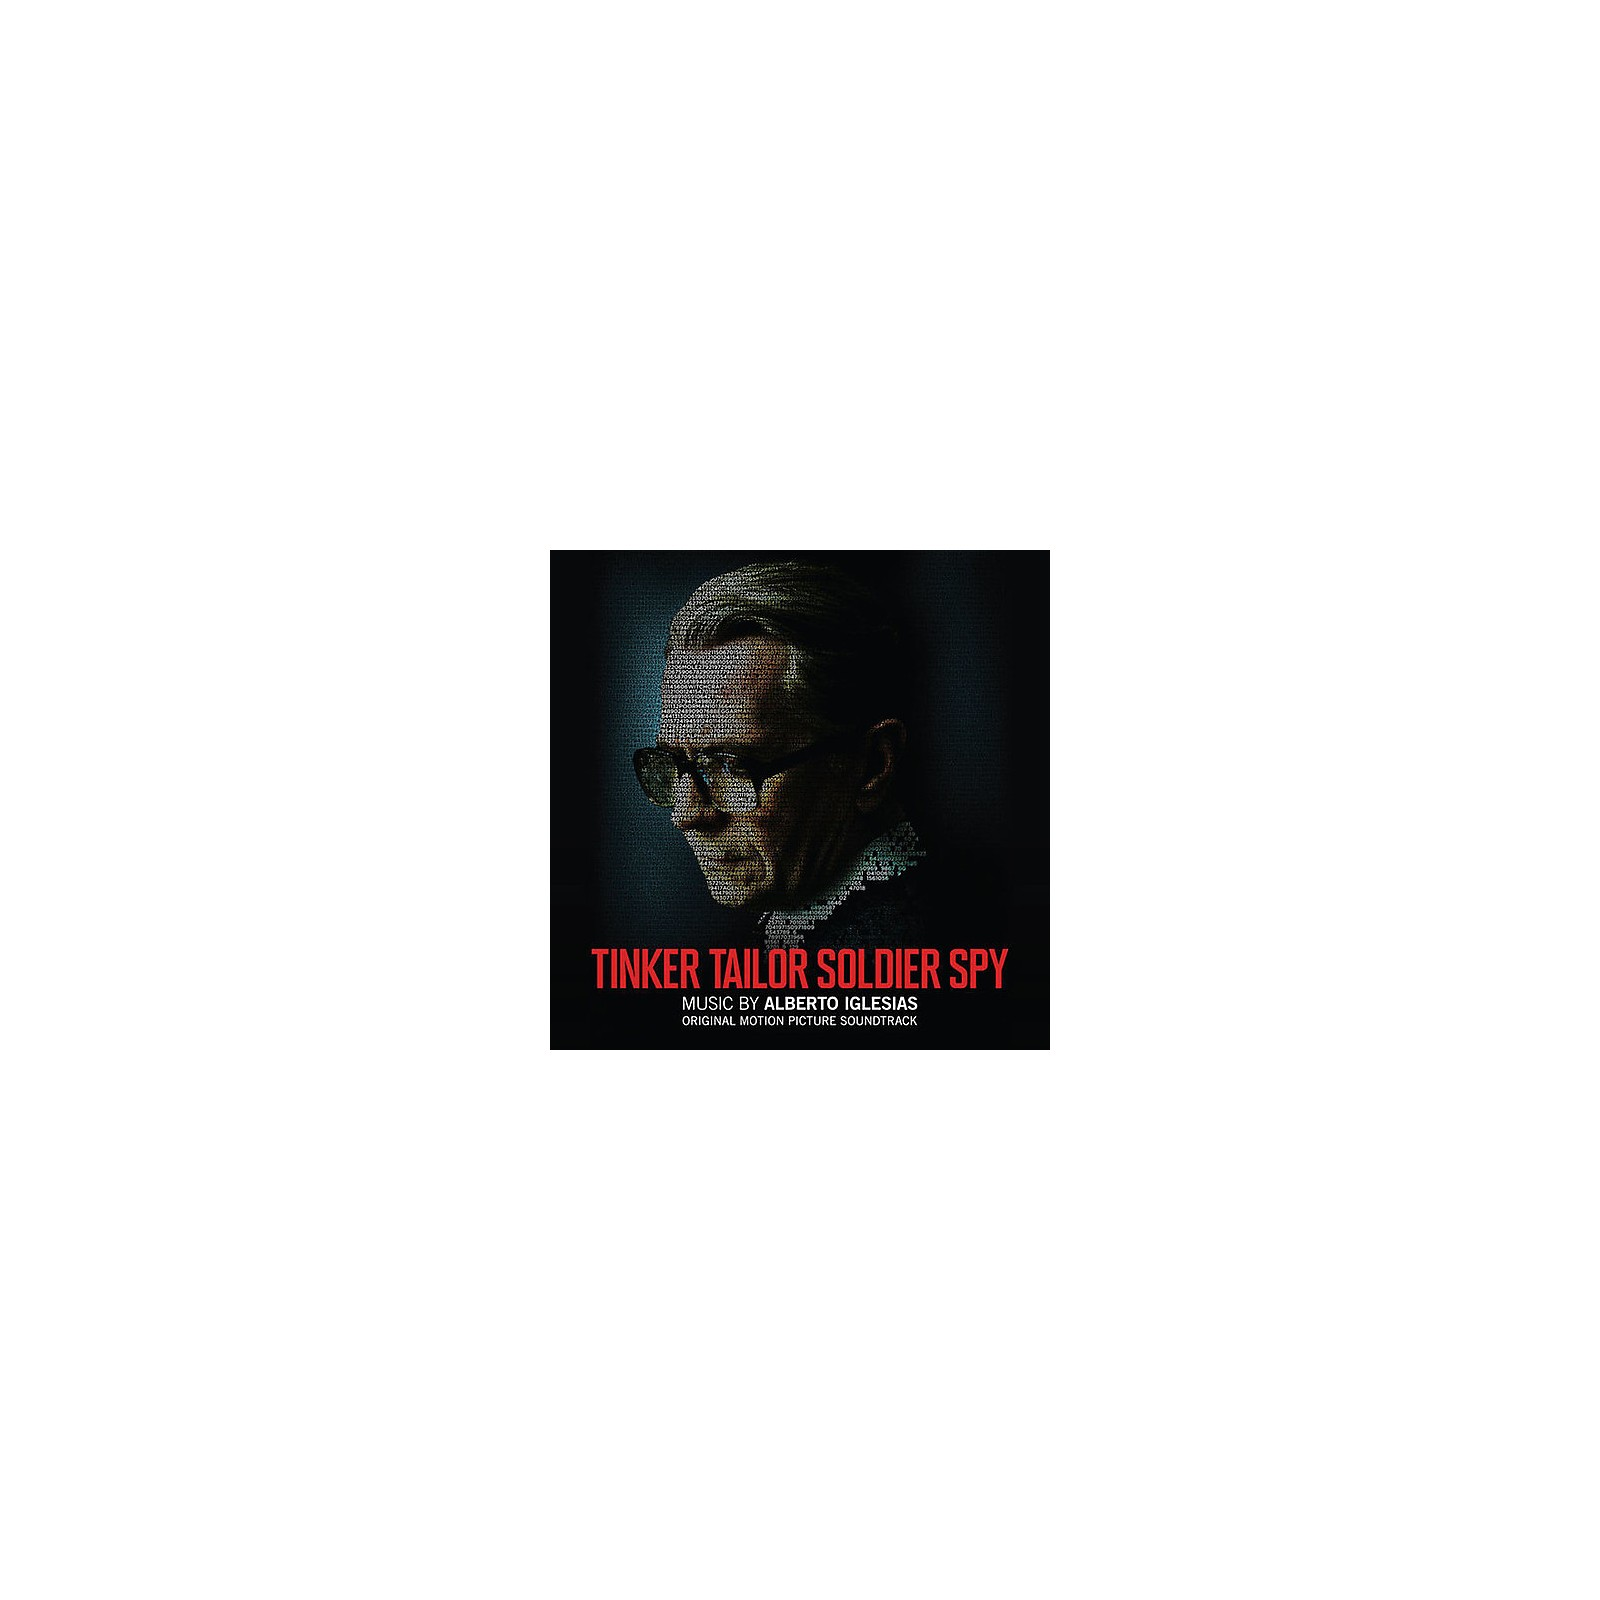 Alliance Alberto Iglesias - Tinker Tailor Soldier Spy (original Soundtrack)